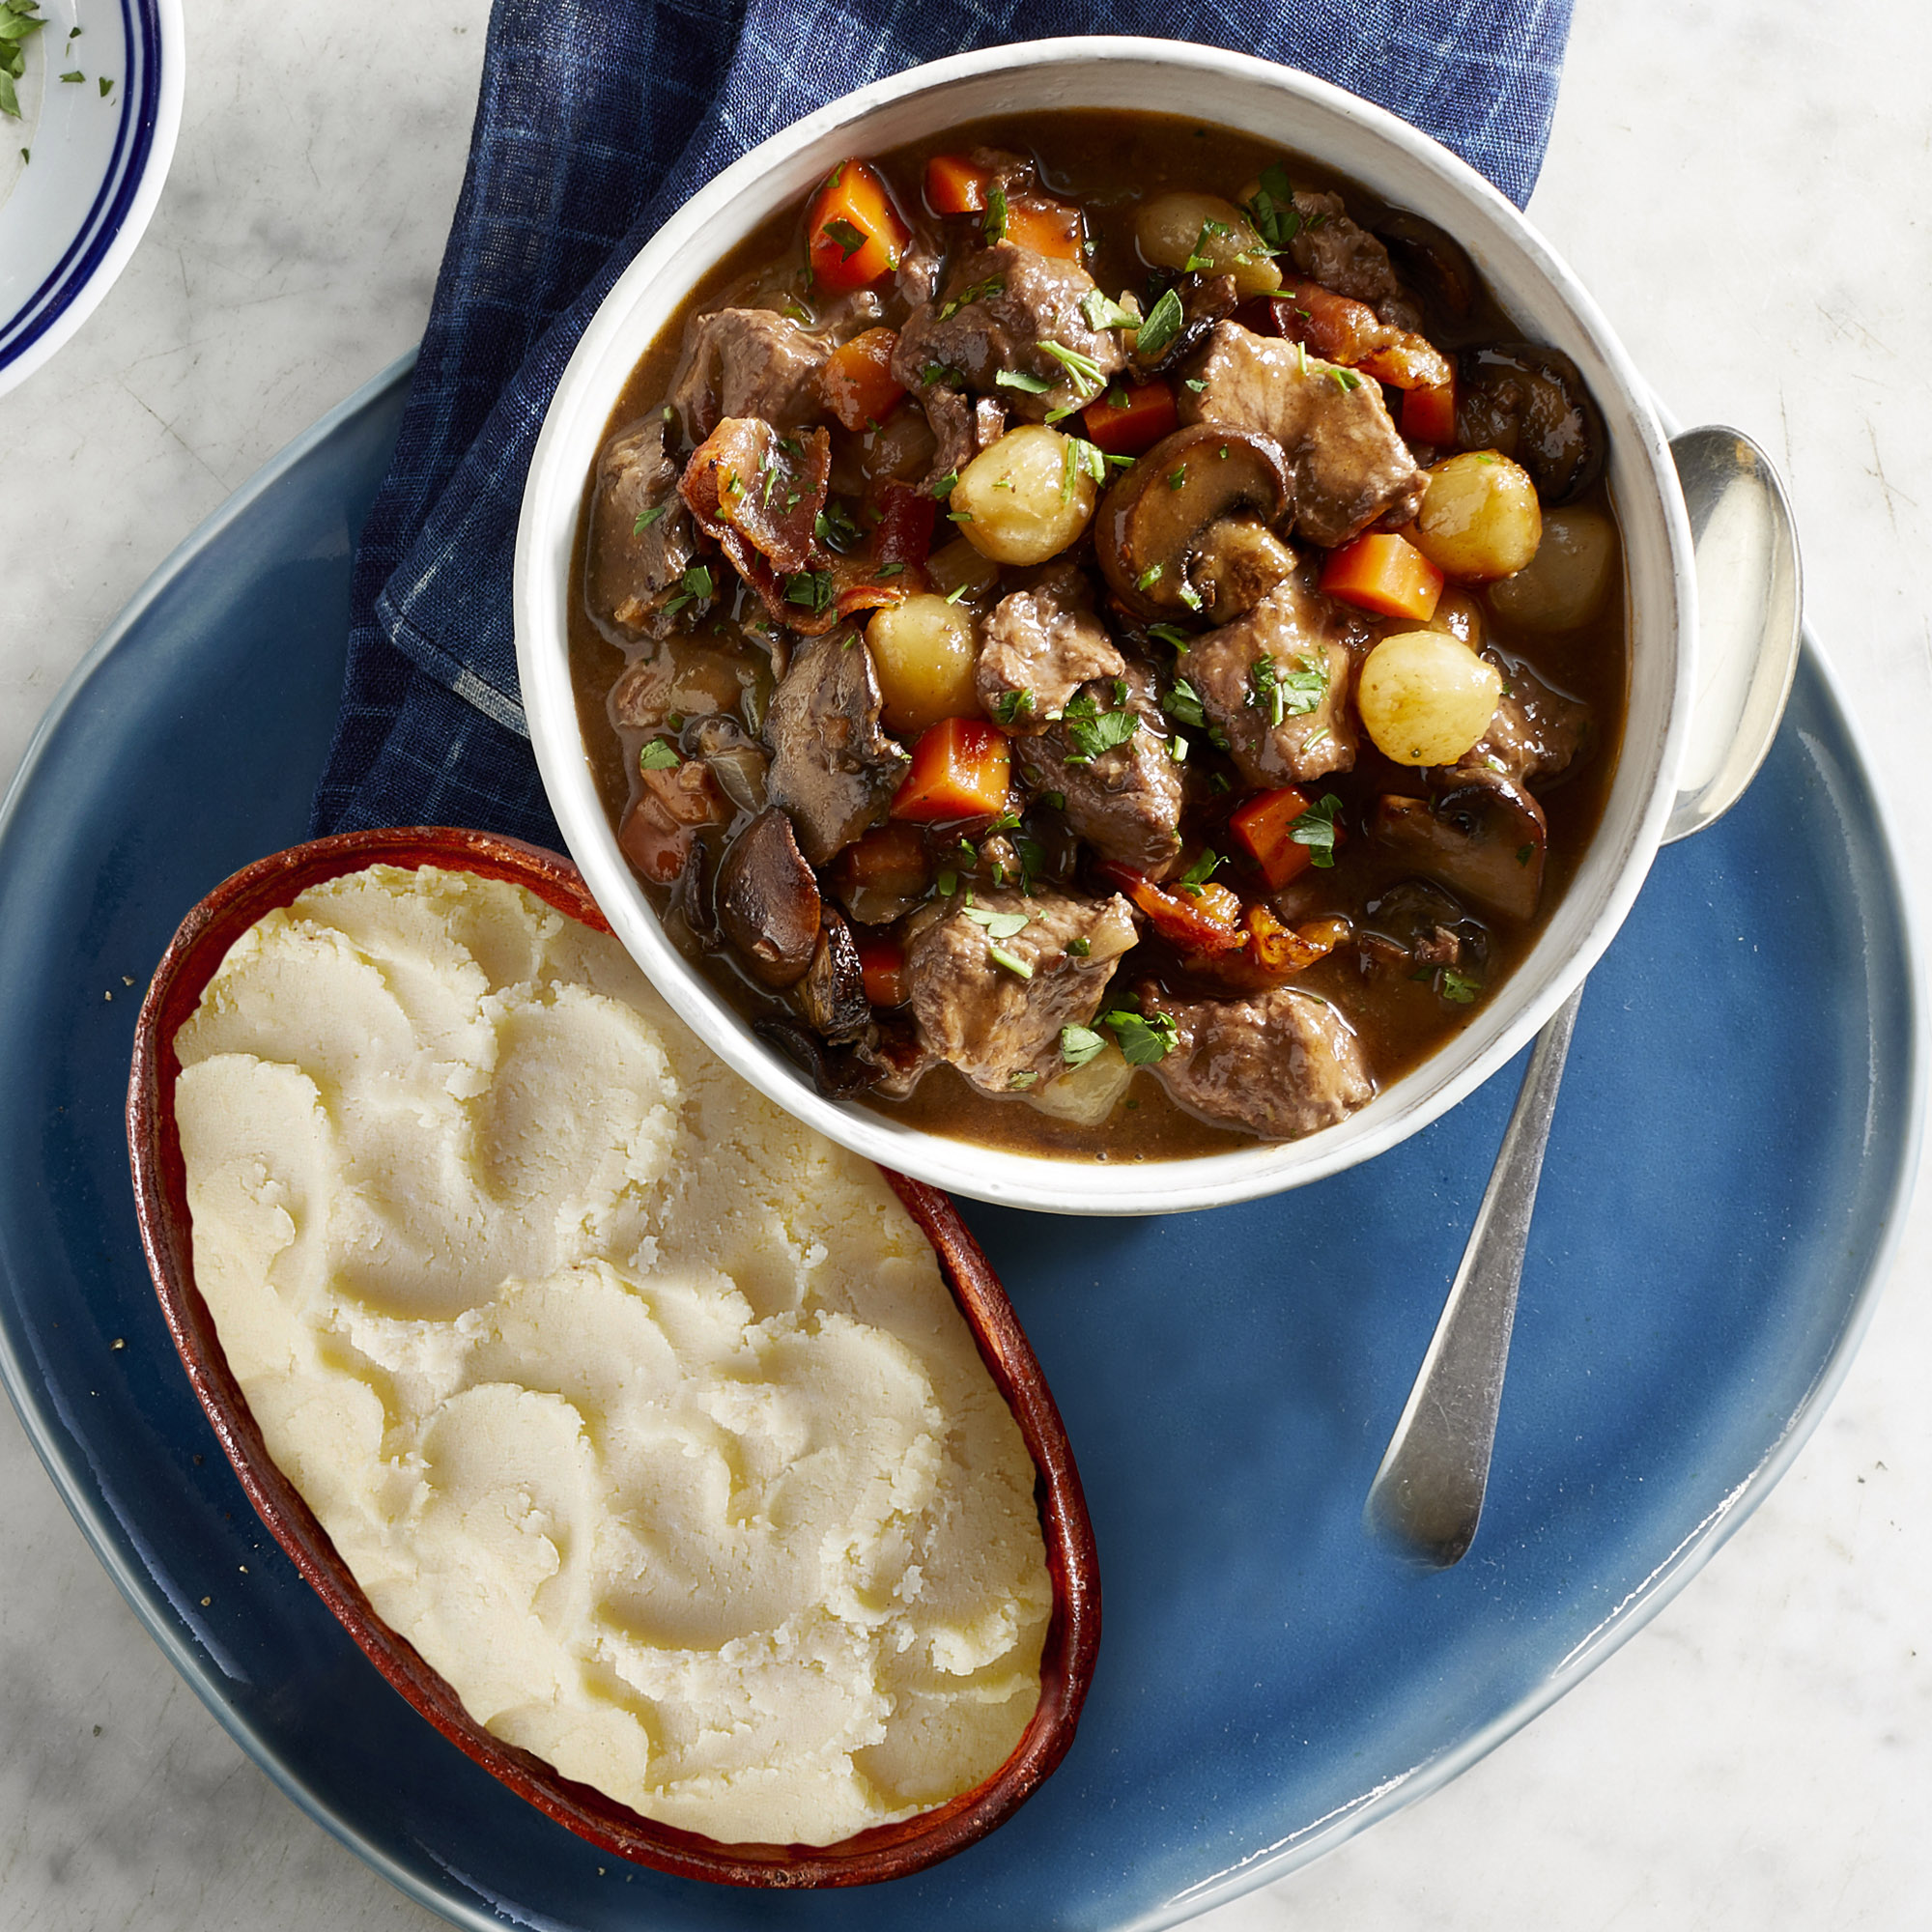 Babeth's Feast,10 Meals, Beef Bourguignon & Simple Potato Puree - Heat & Serve